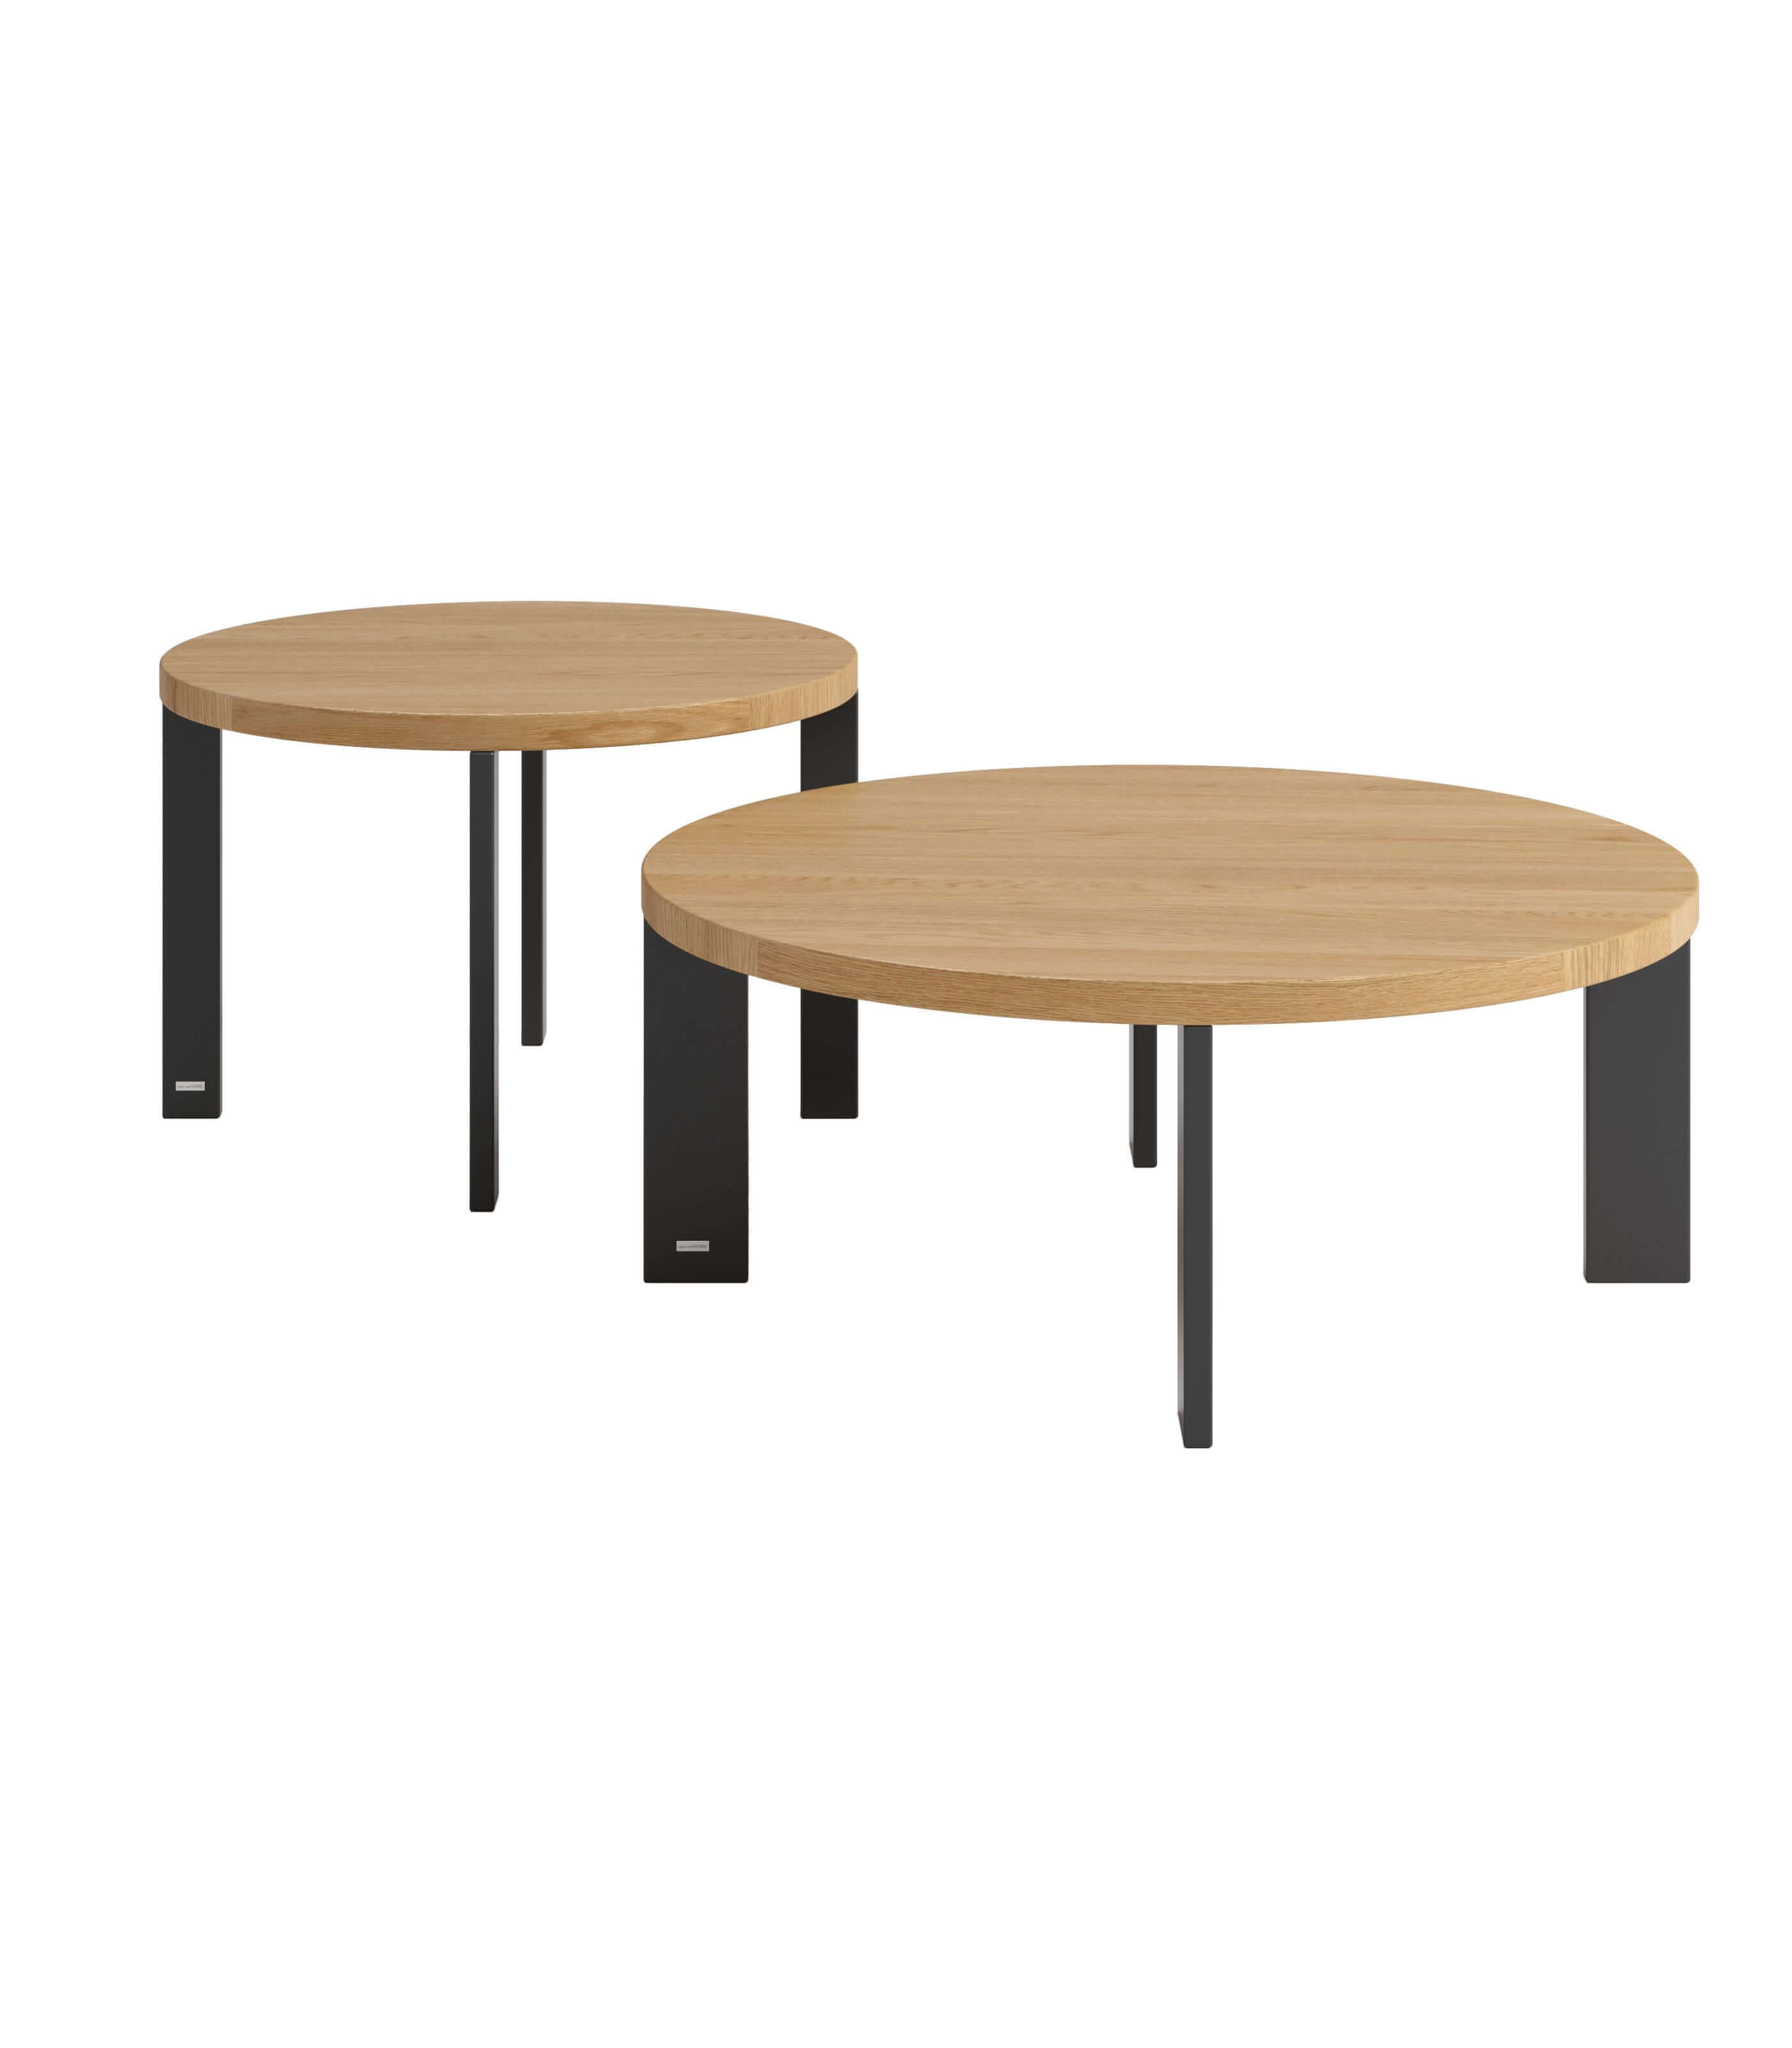 stolik do salonu okrągły polski dab